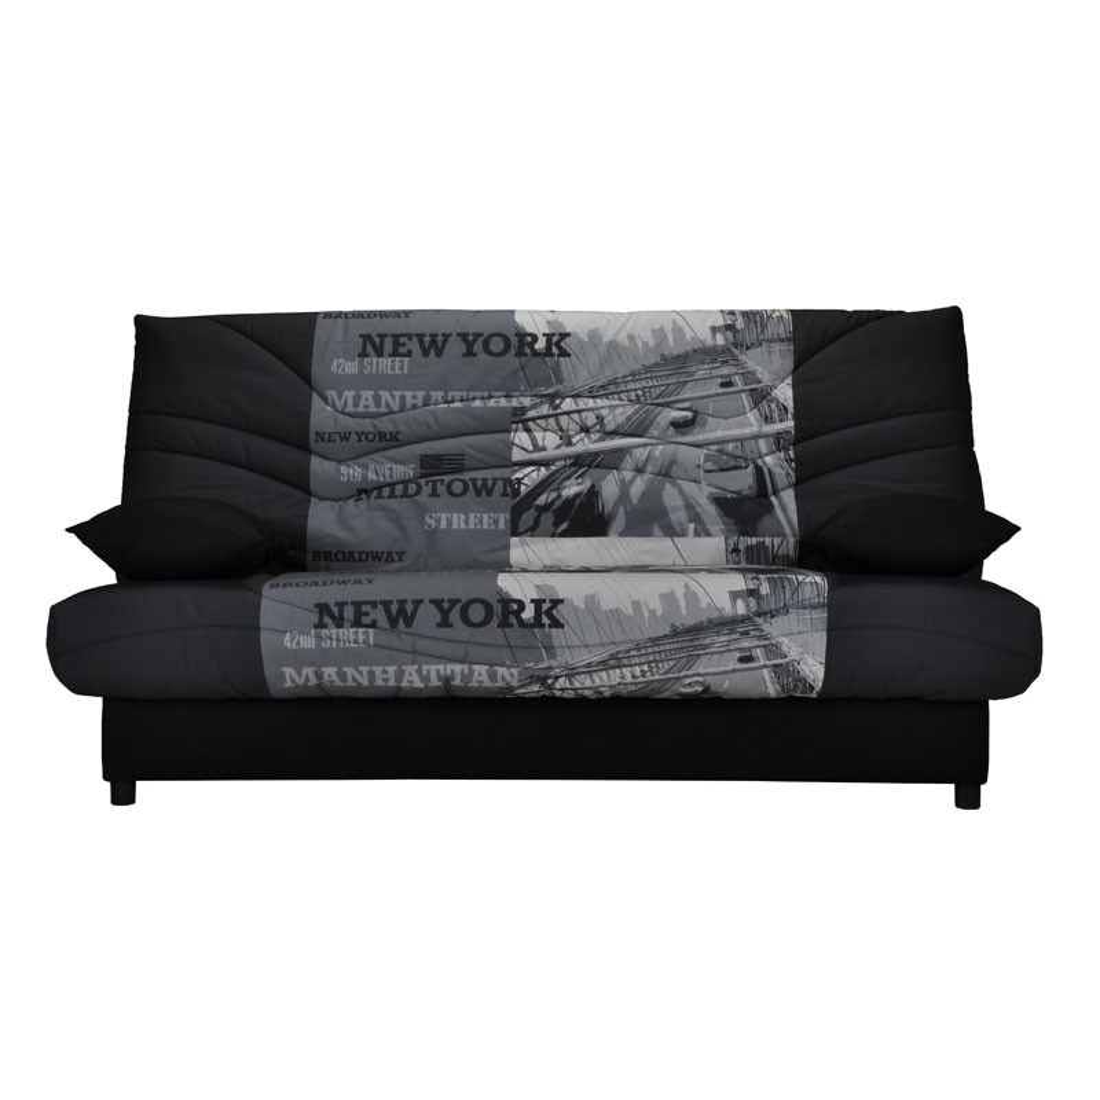 banquette lit clic clac gris noir ny matelas hr 130 cm speed tsar n 12. Black Bedroom Furniture Sets. Home Design Ideas